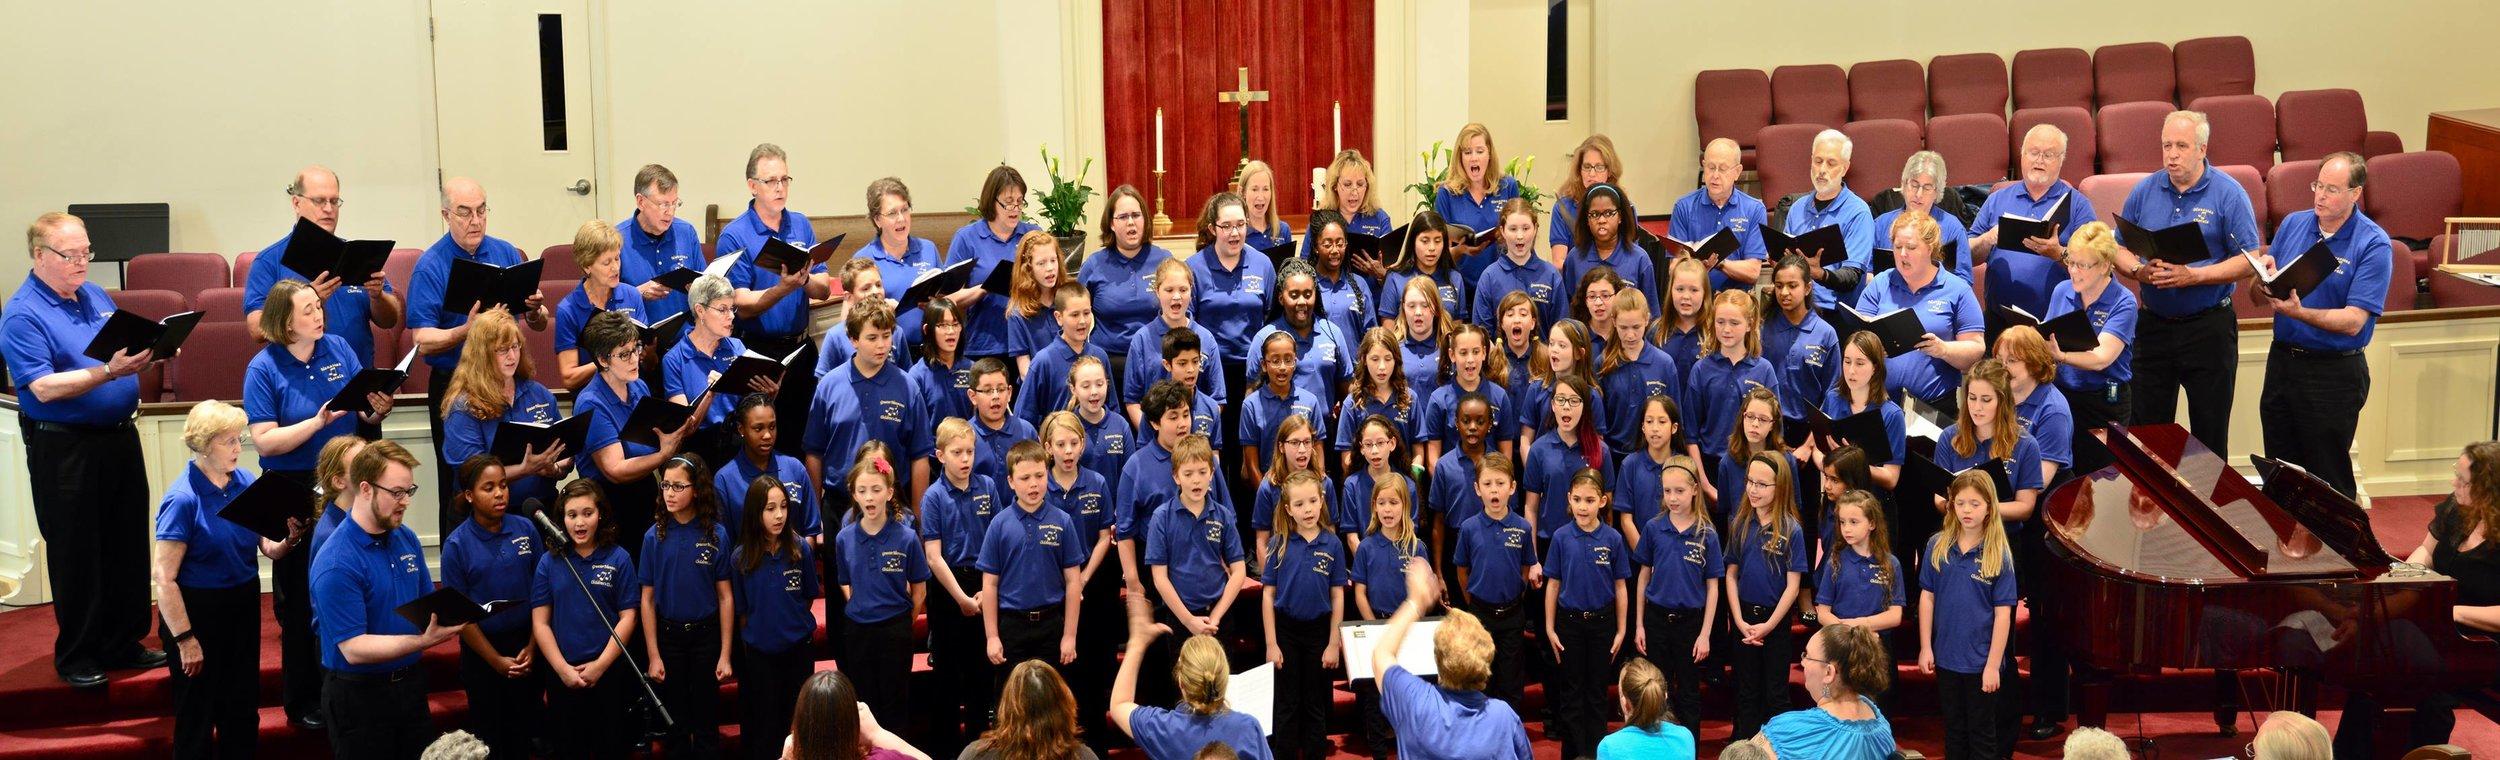 Copy of Greater Manassas Children's Choir